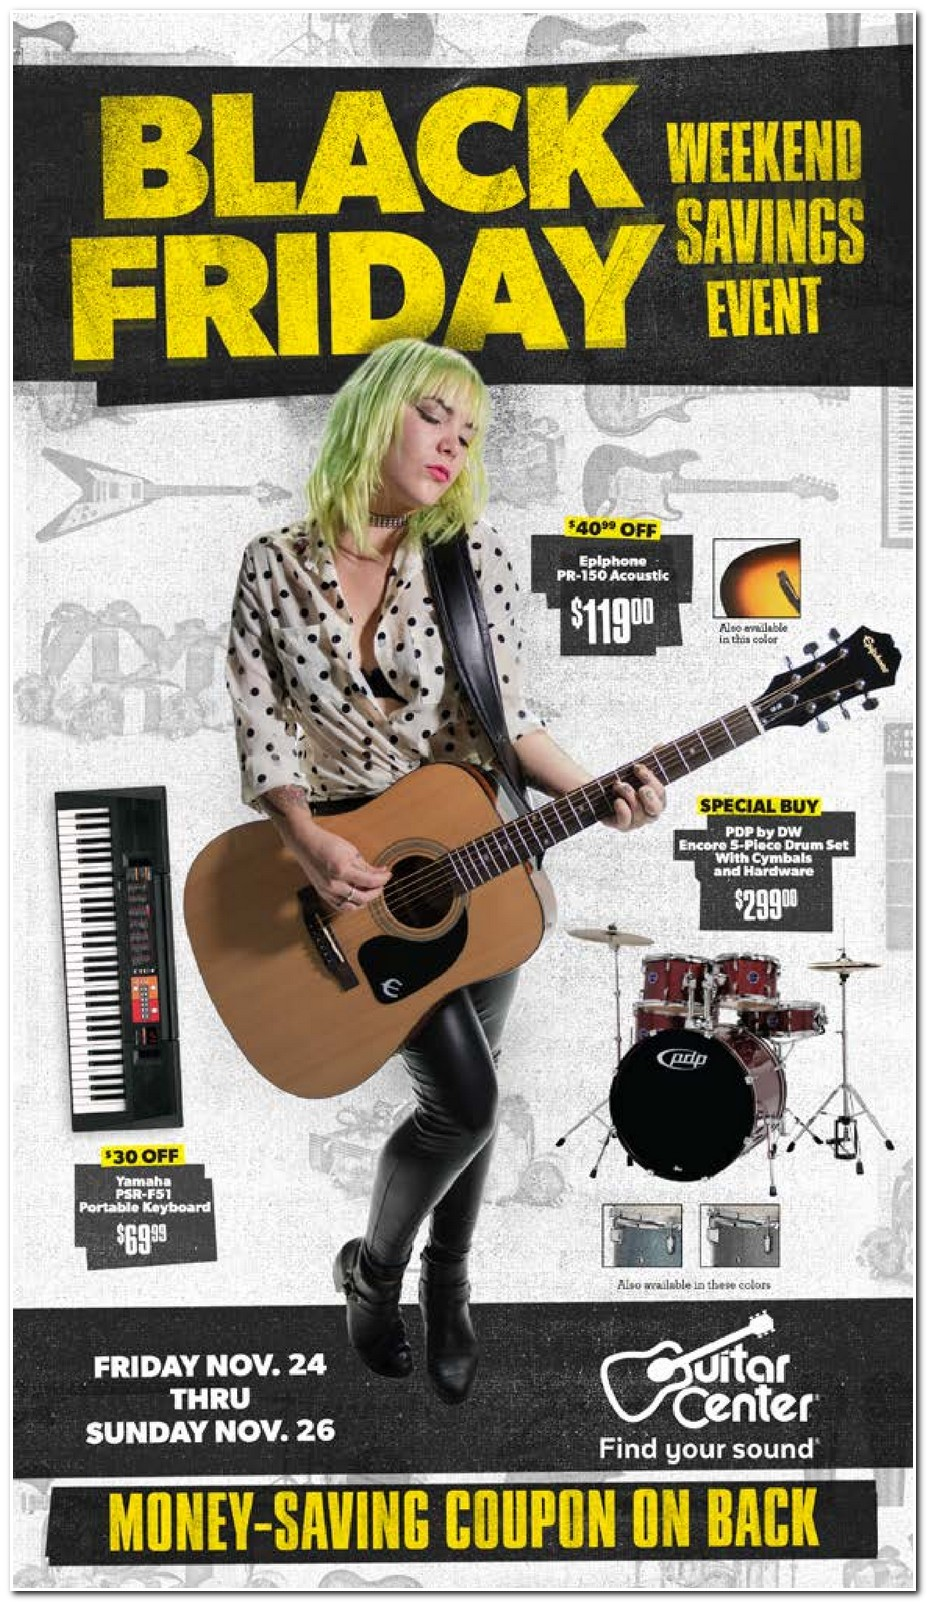 Guitar center black friday coupon 2018